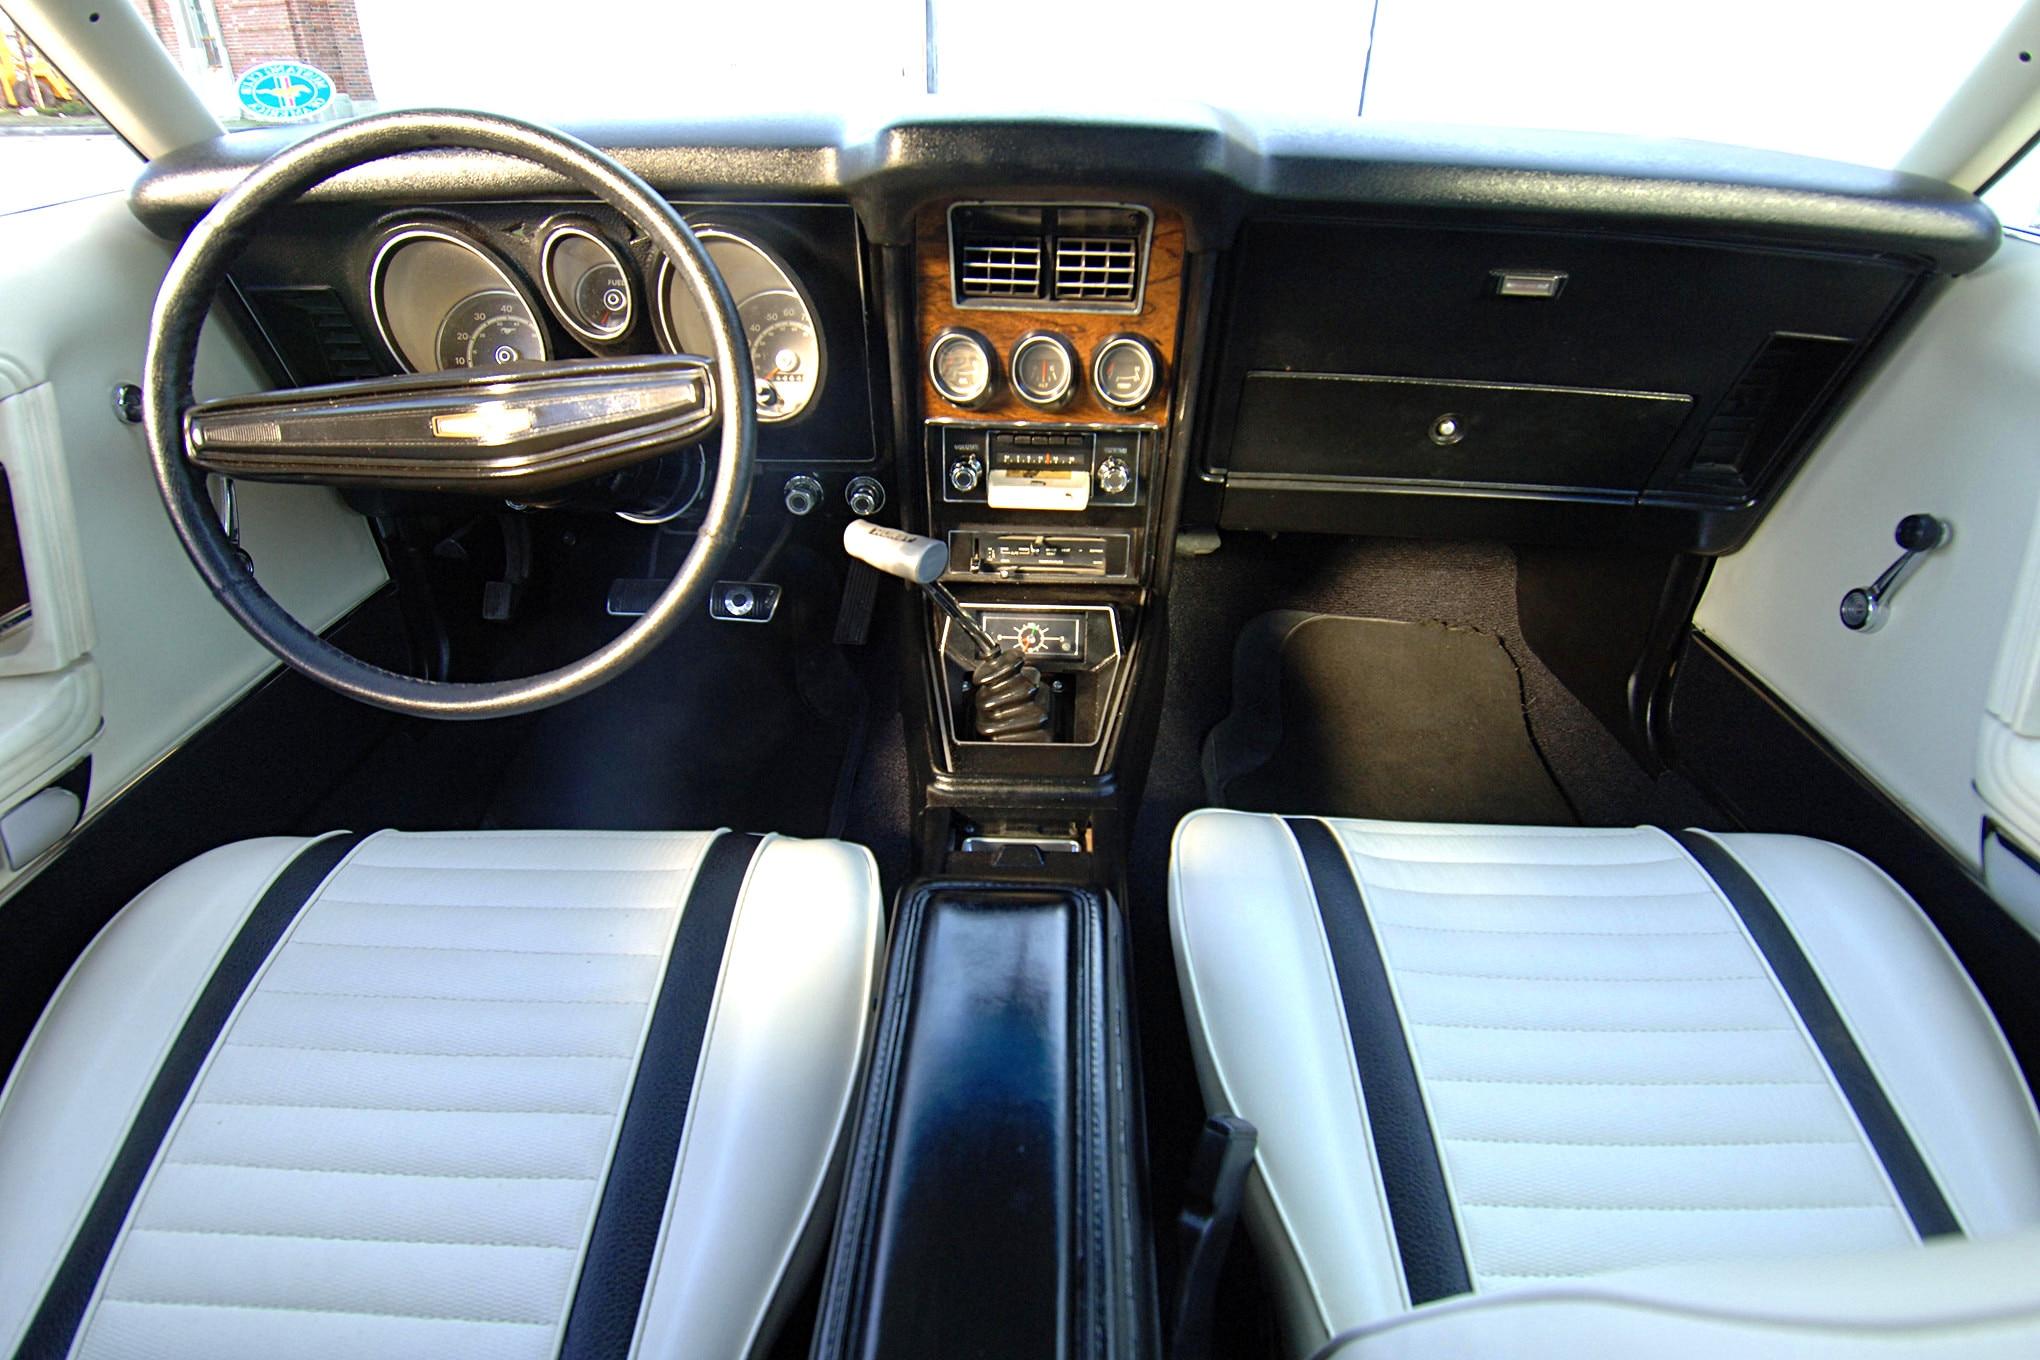 034 1971 73 Mustang SpottersGuide Heasley